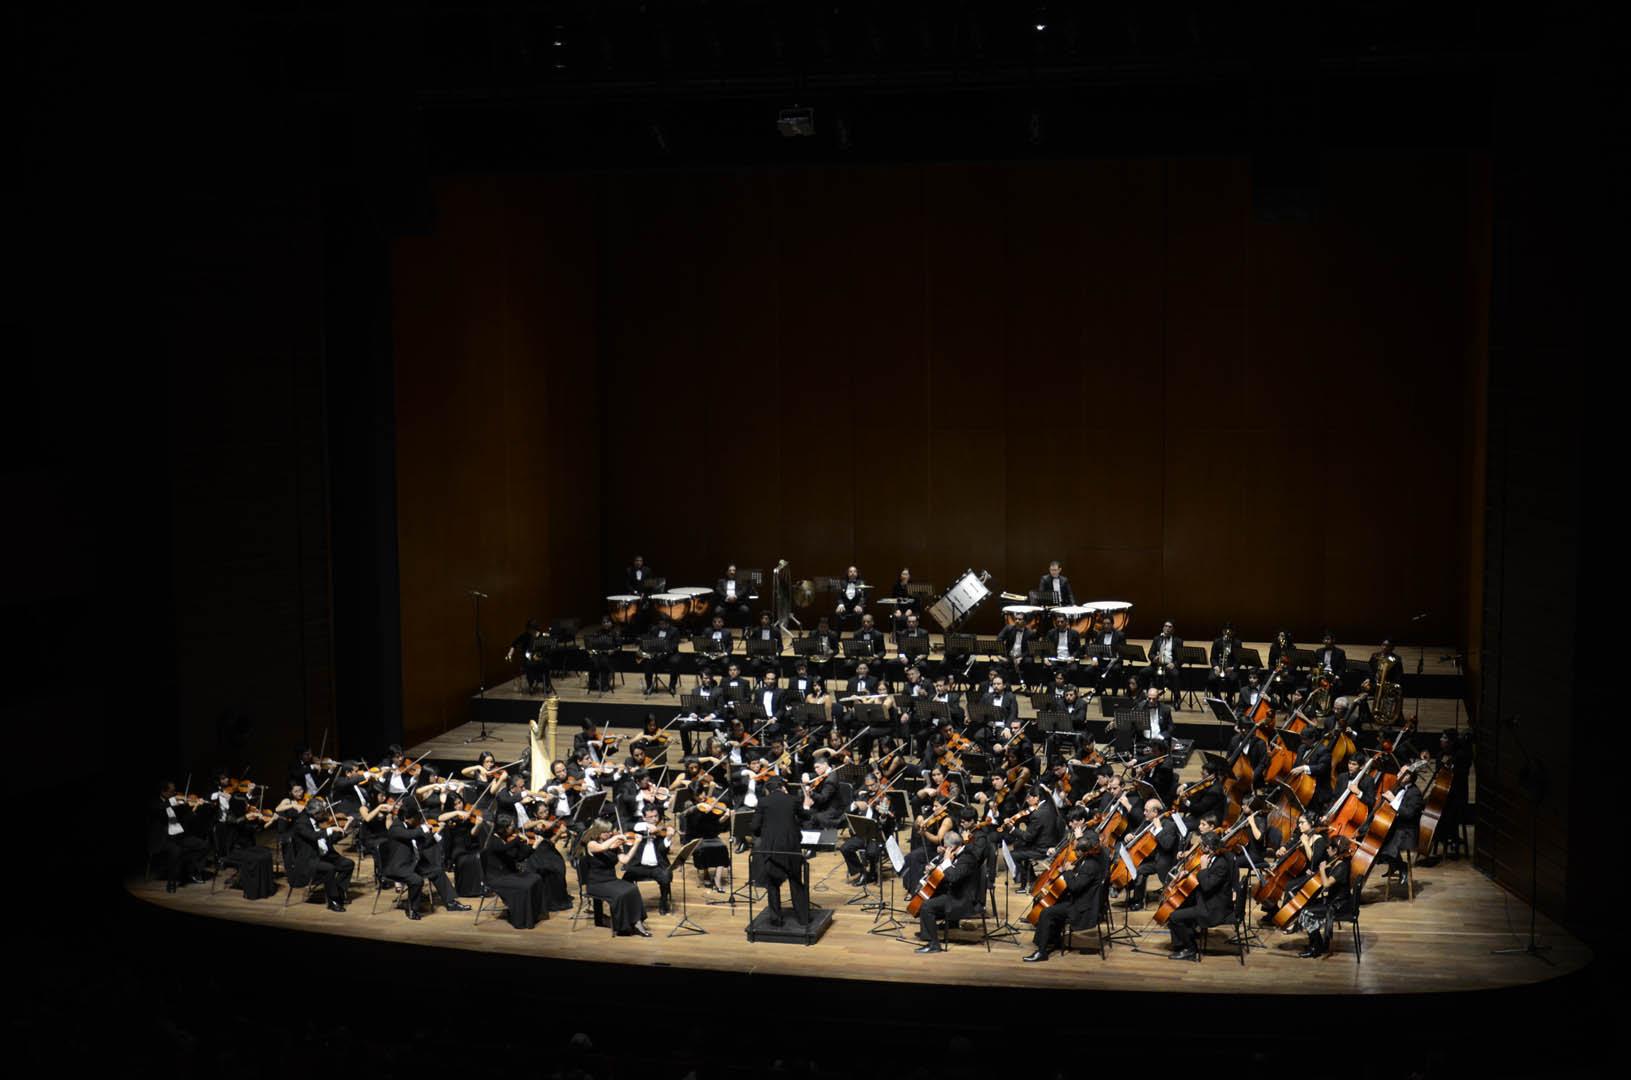 Fotos © Gran Teatro Nacional